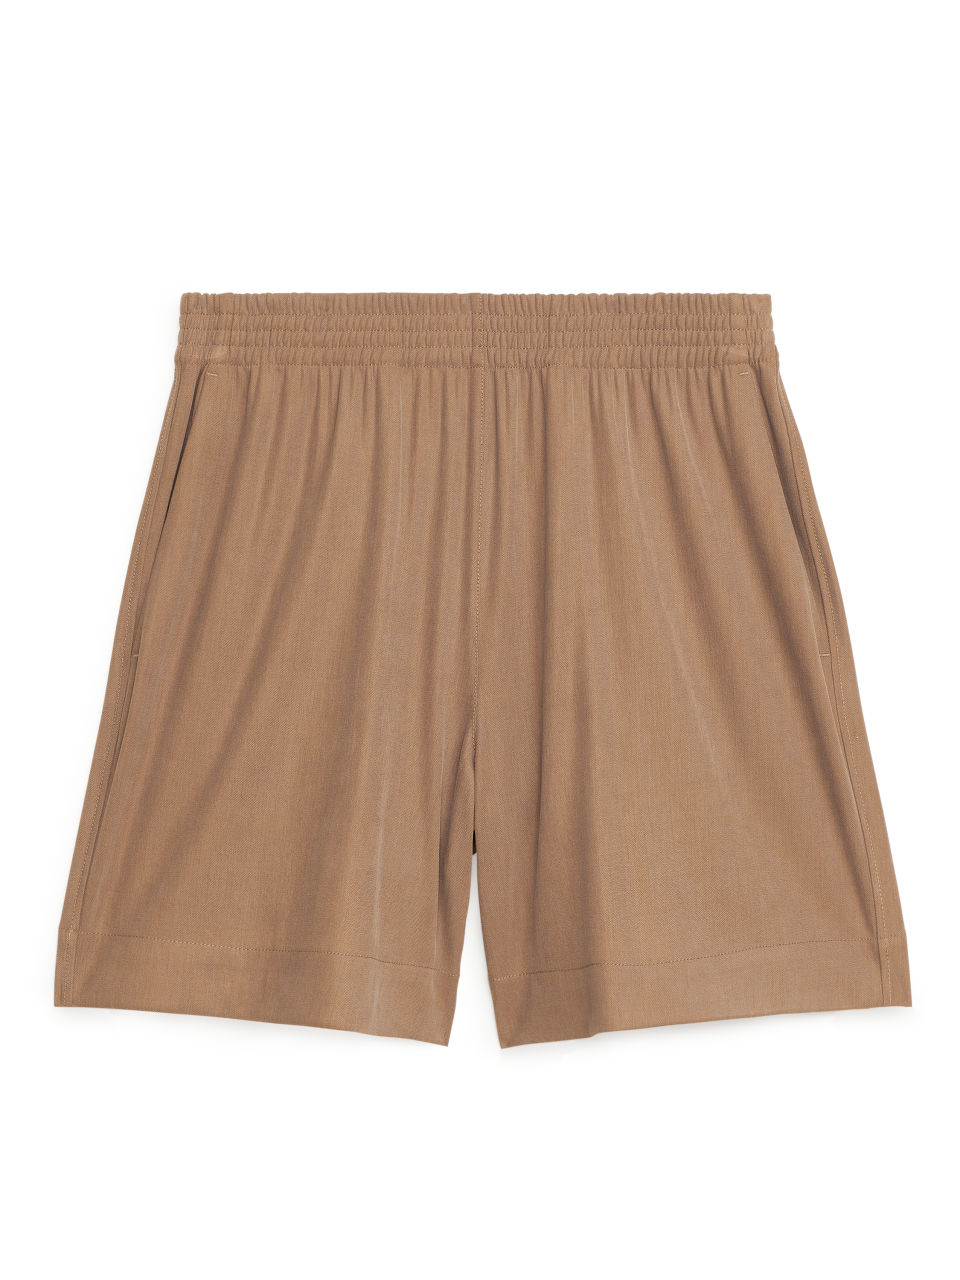 Modal Blend Jersey Shorts - Yellow